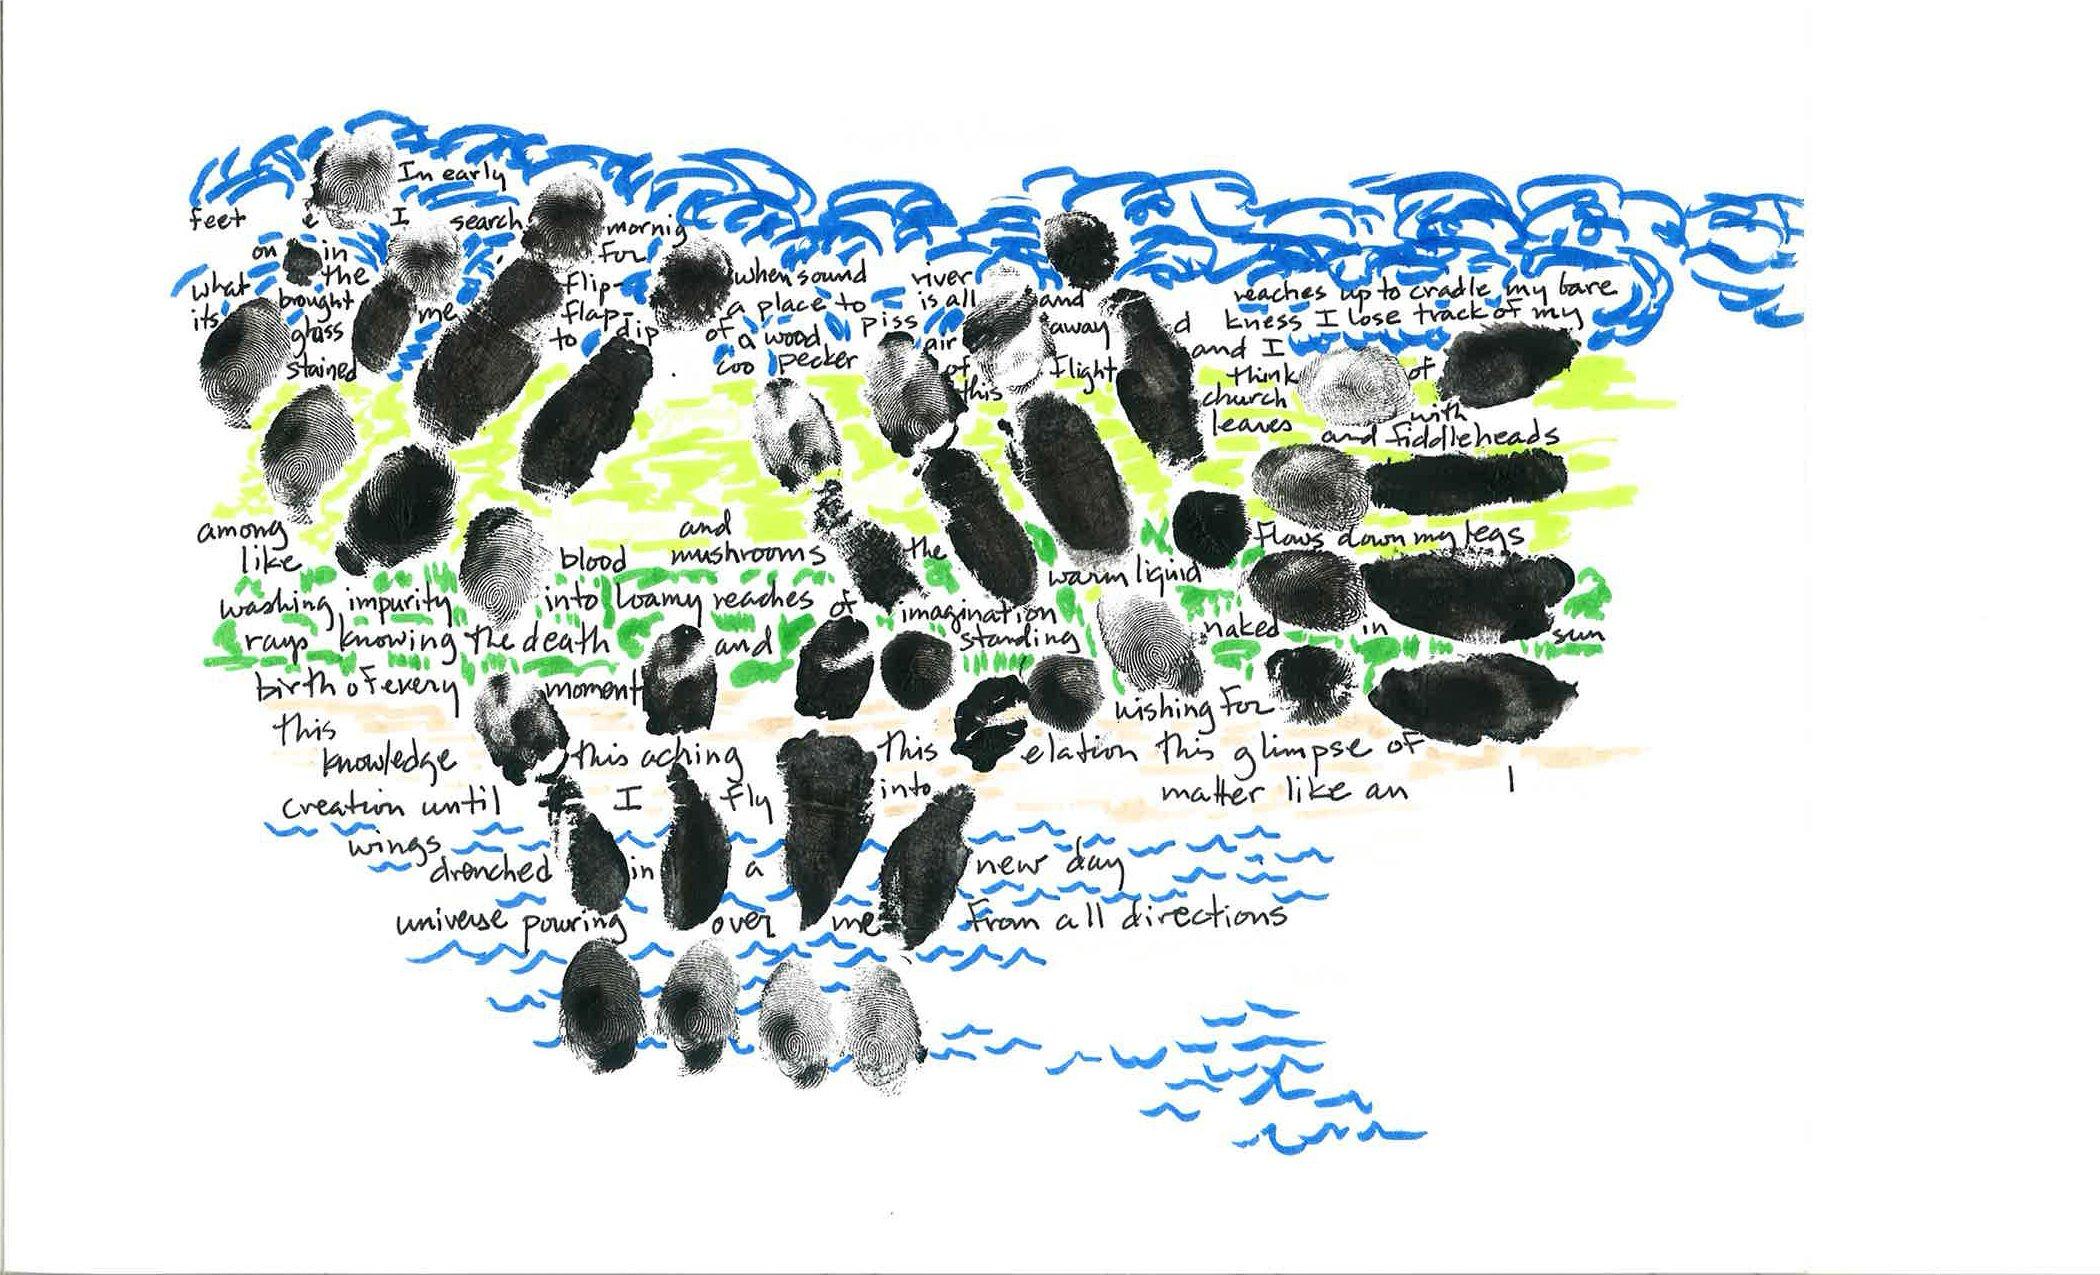 Earth Words, Mixed Media by Brad Garber, Mud Season Review